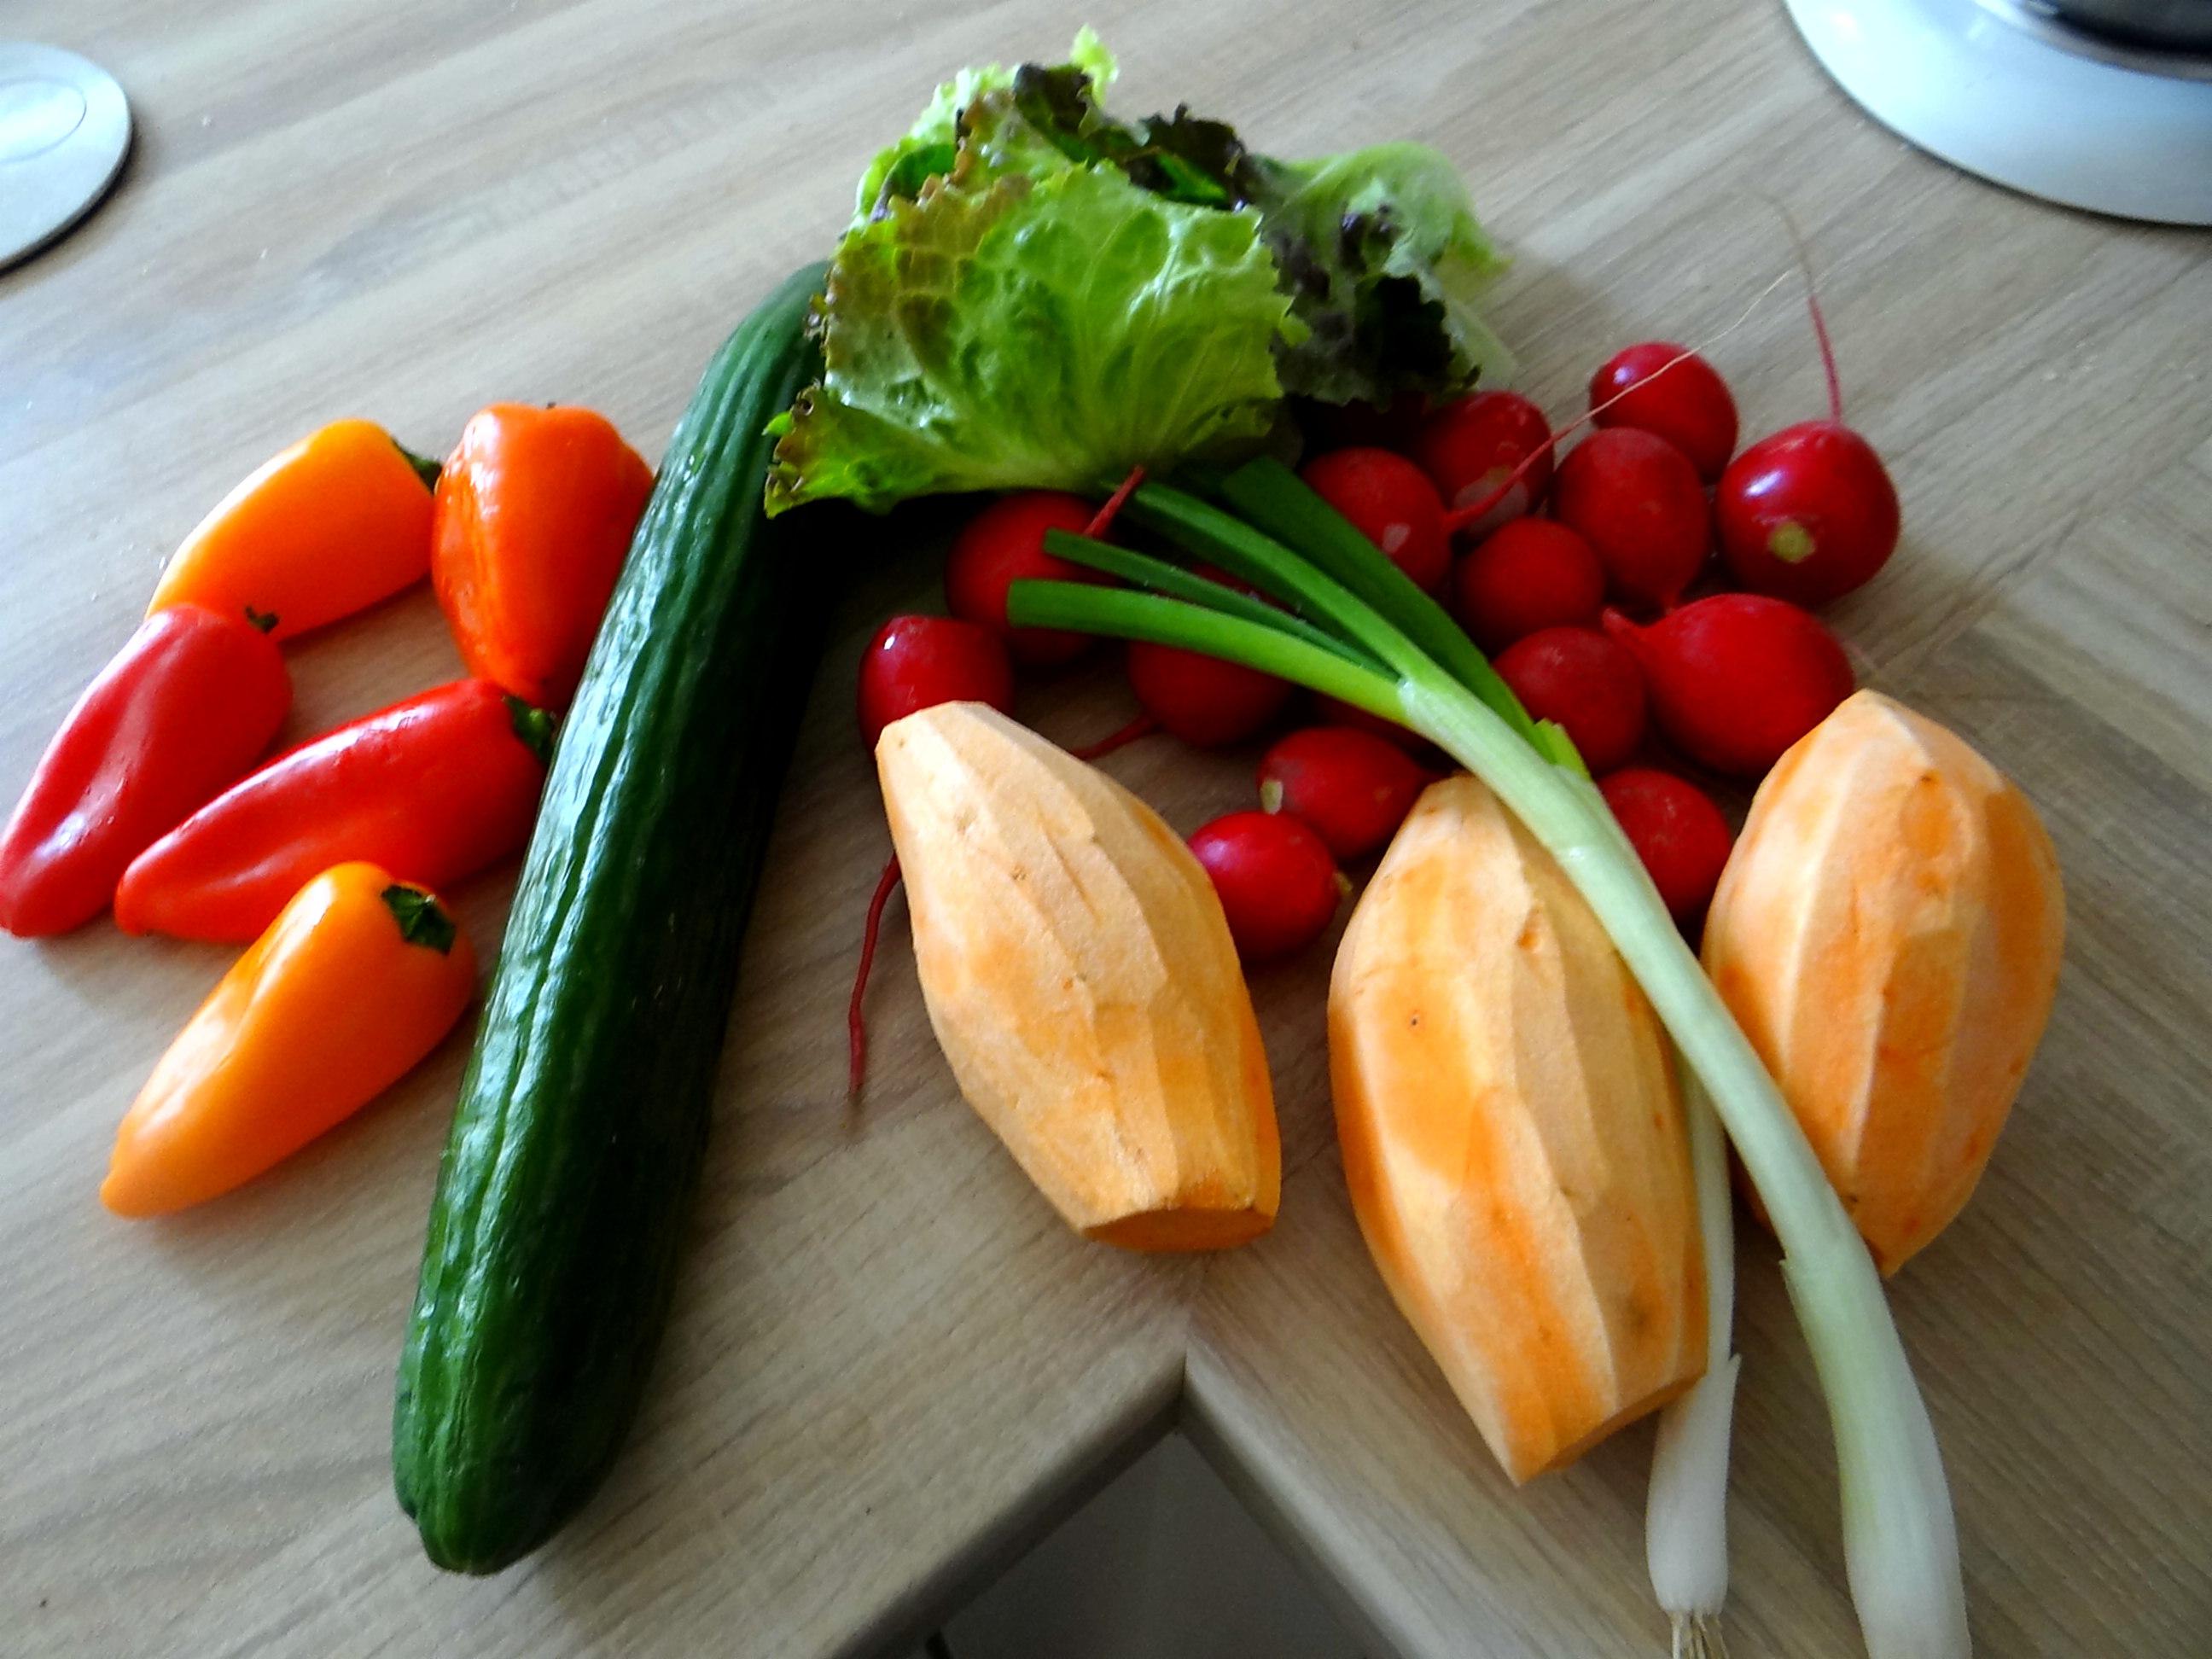 Süßkartoffel Spalten,Feta Creme,Salate (6)